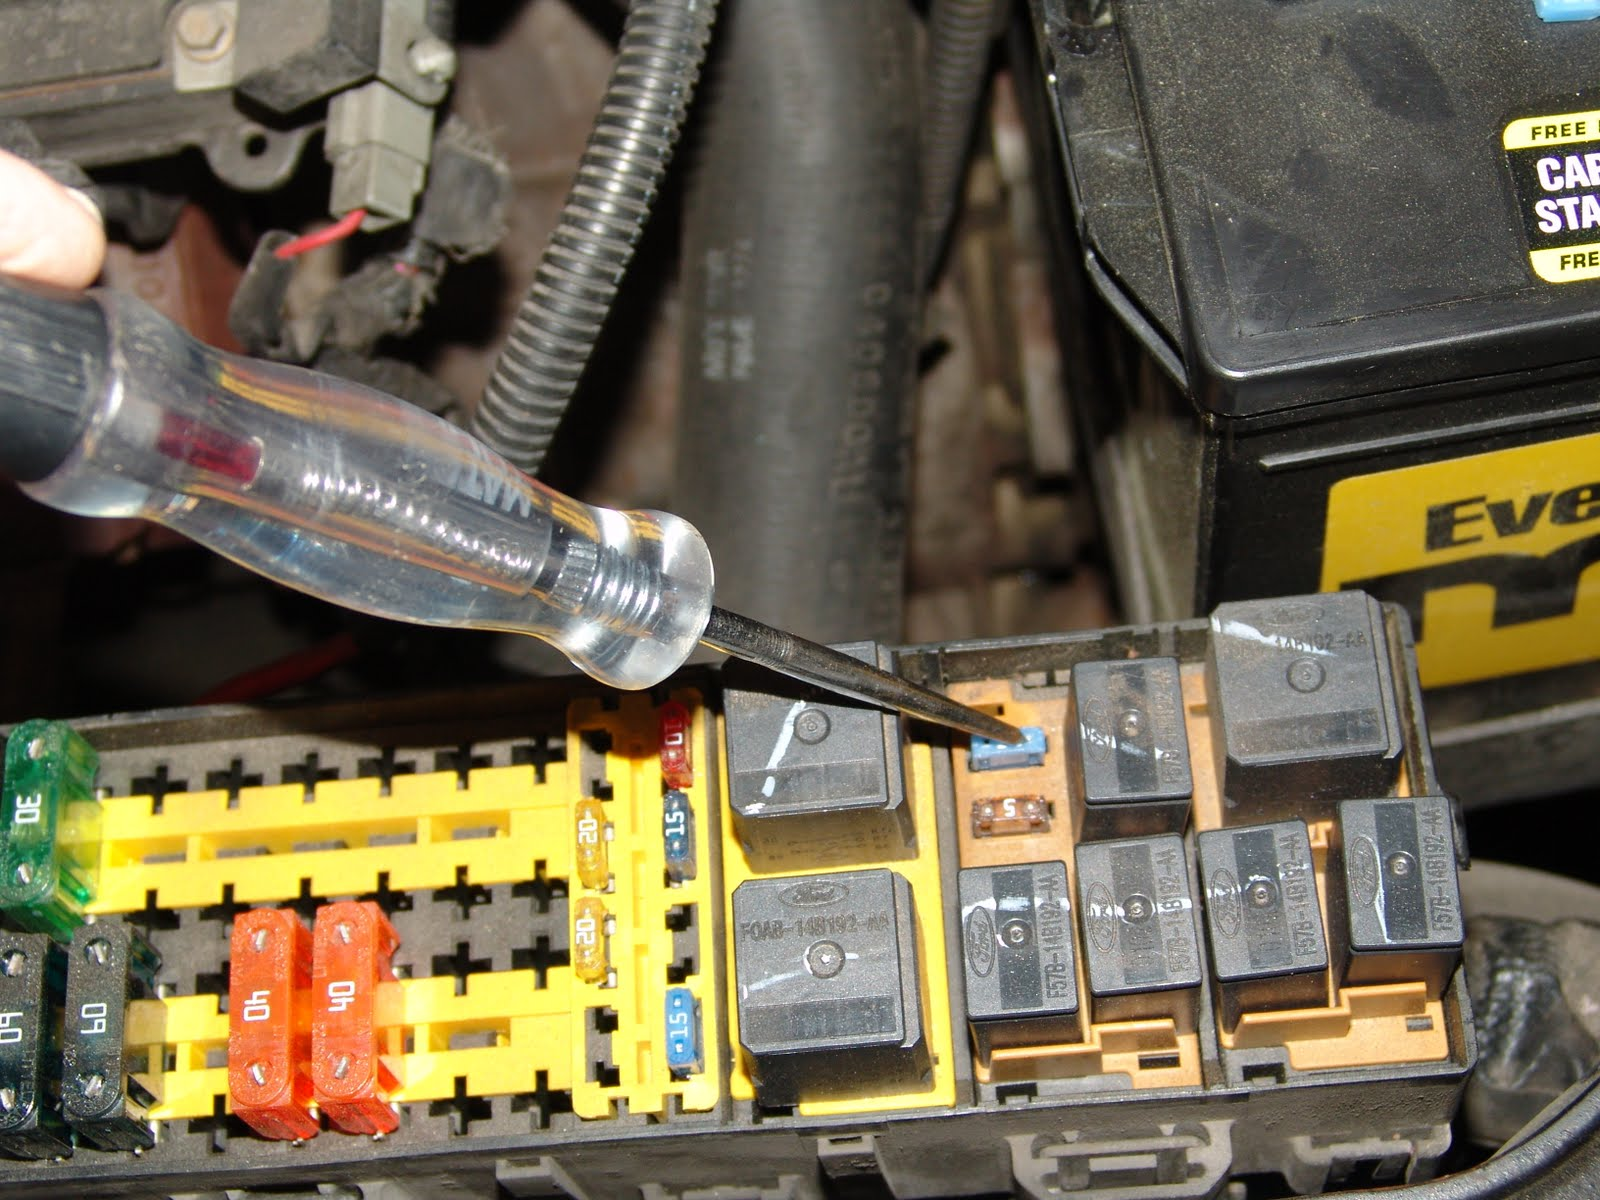 2000 Ford Taurus Alternator Wiring Diagram Sharepoint 2010 Farm Architecture 2005 Explorer Heated Seat Not Working